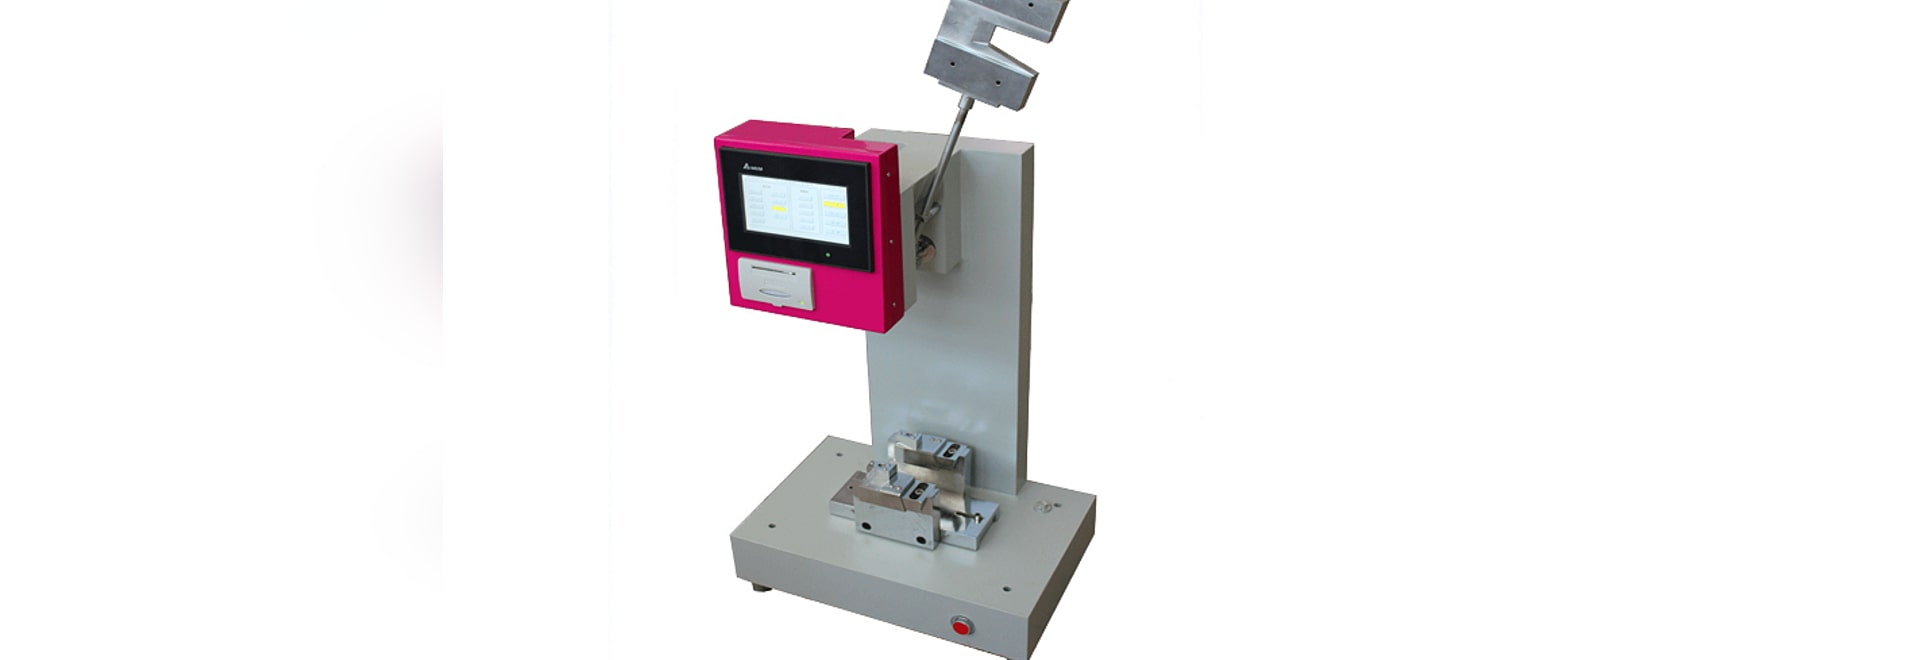 machine d'essai d'impact de pendule